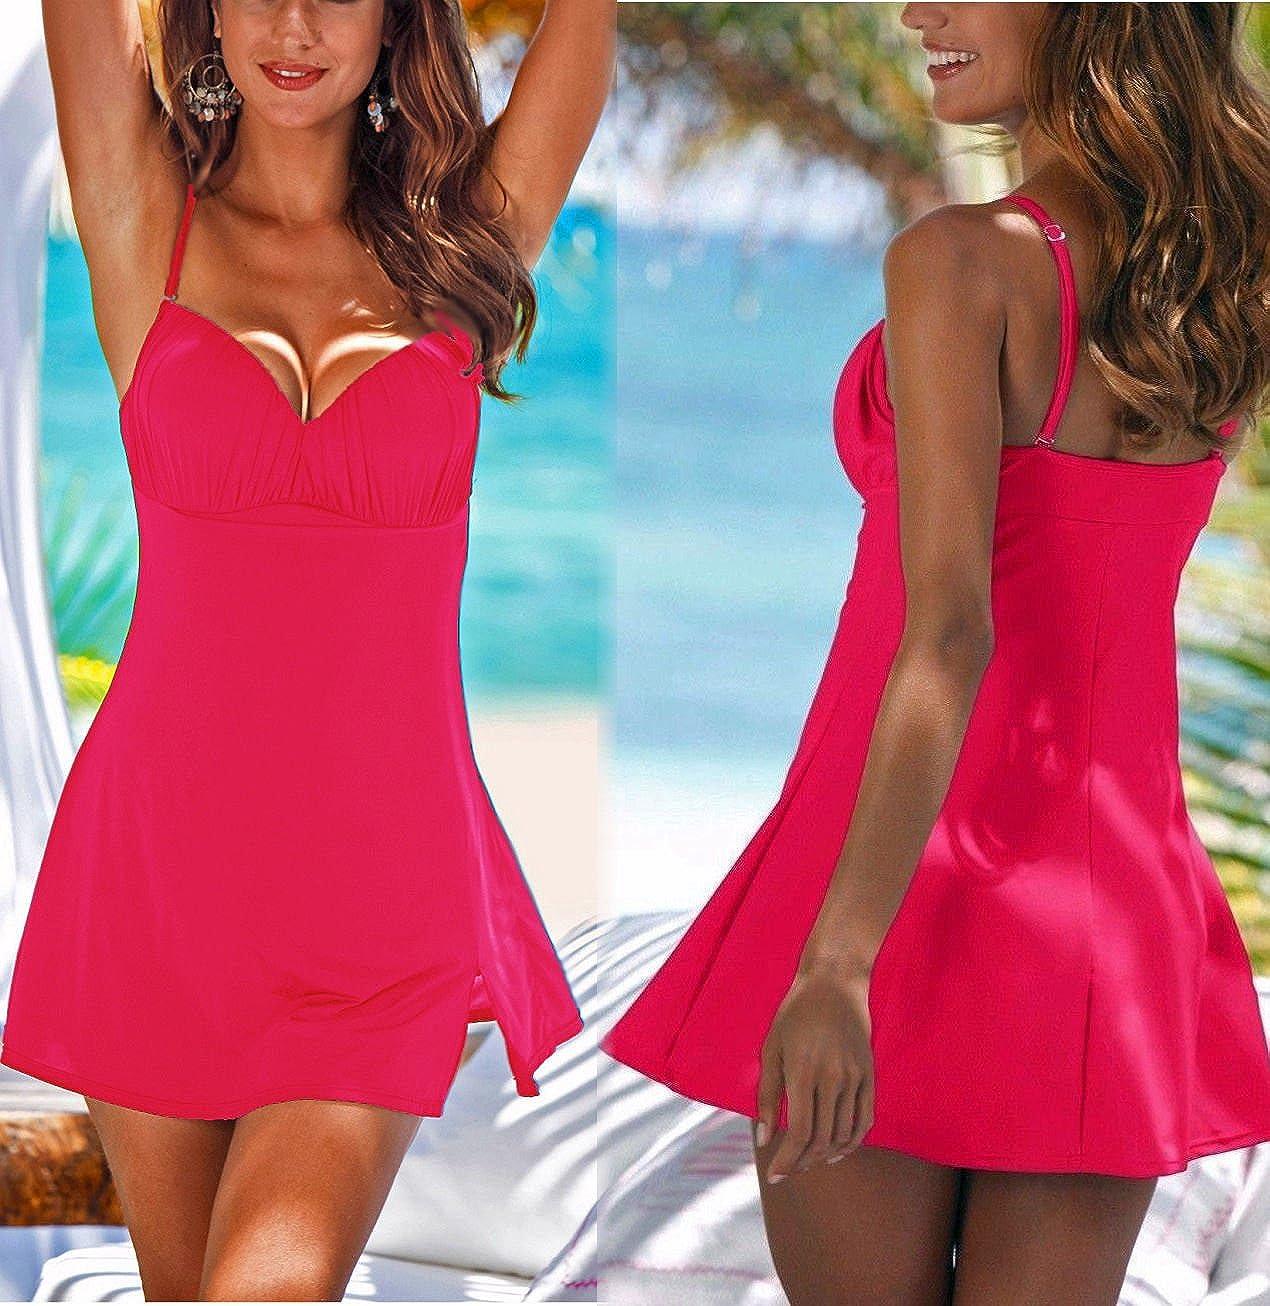 3cd673e03a30b Markenware Multiway Badeanzug Badeanzugkleid Badekleid Gr. 50 Cup C - 100 C  pink 972597: Amazon.de: Bekleidung